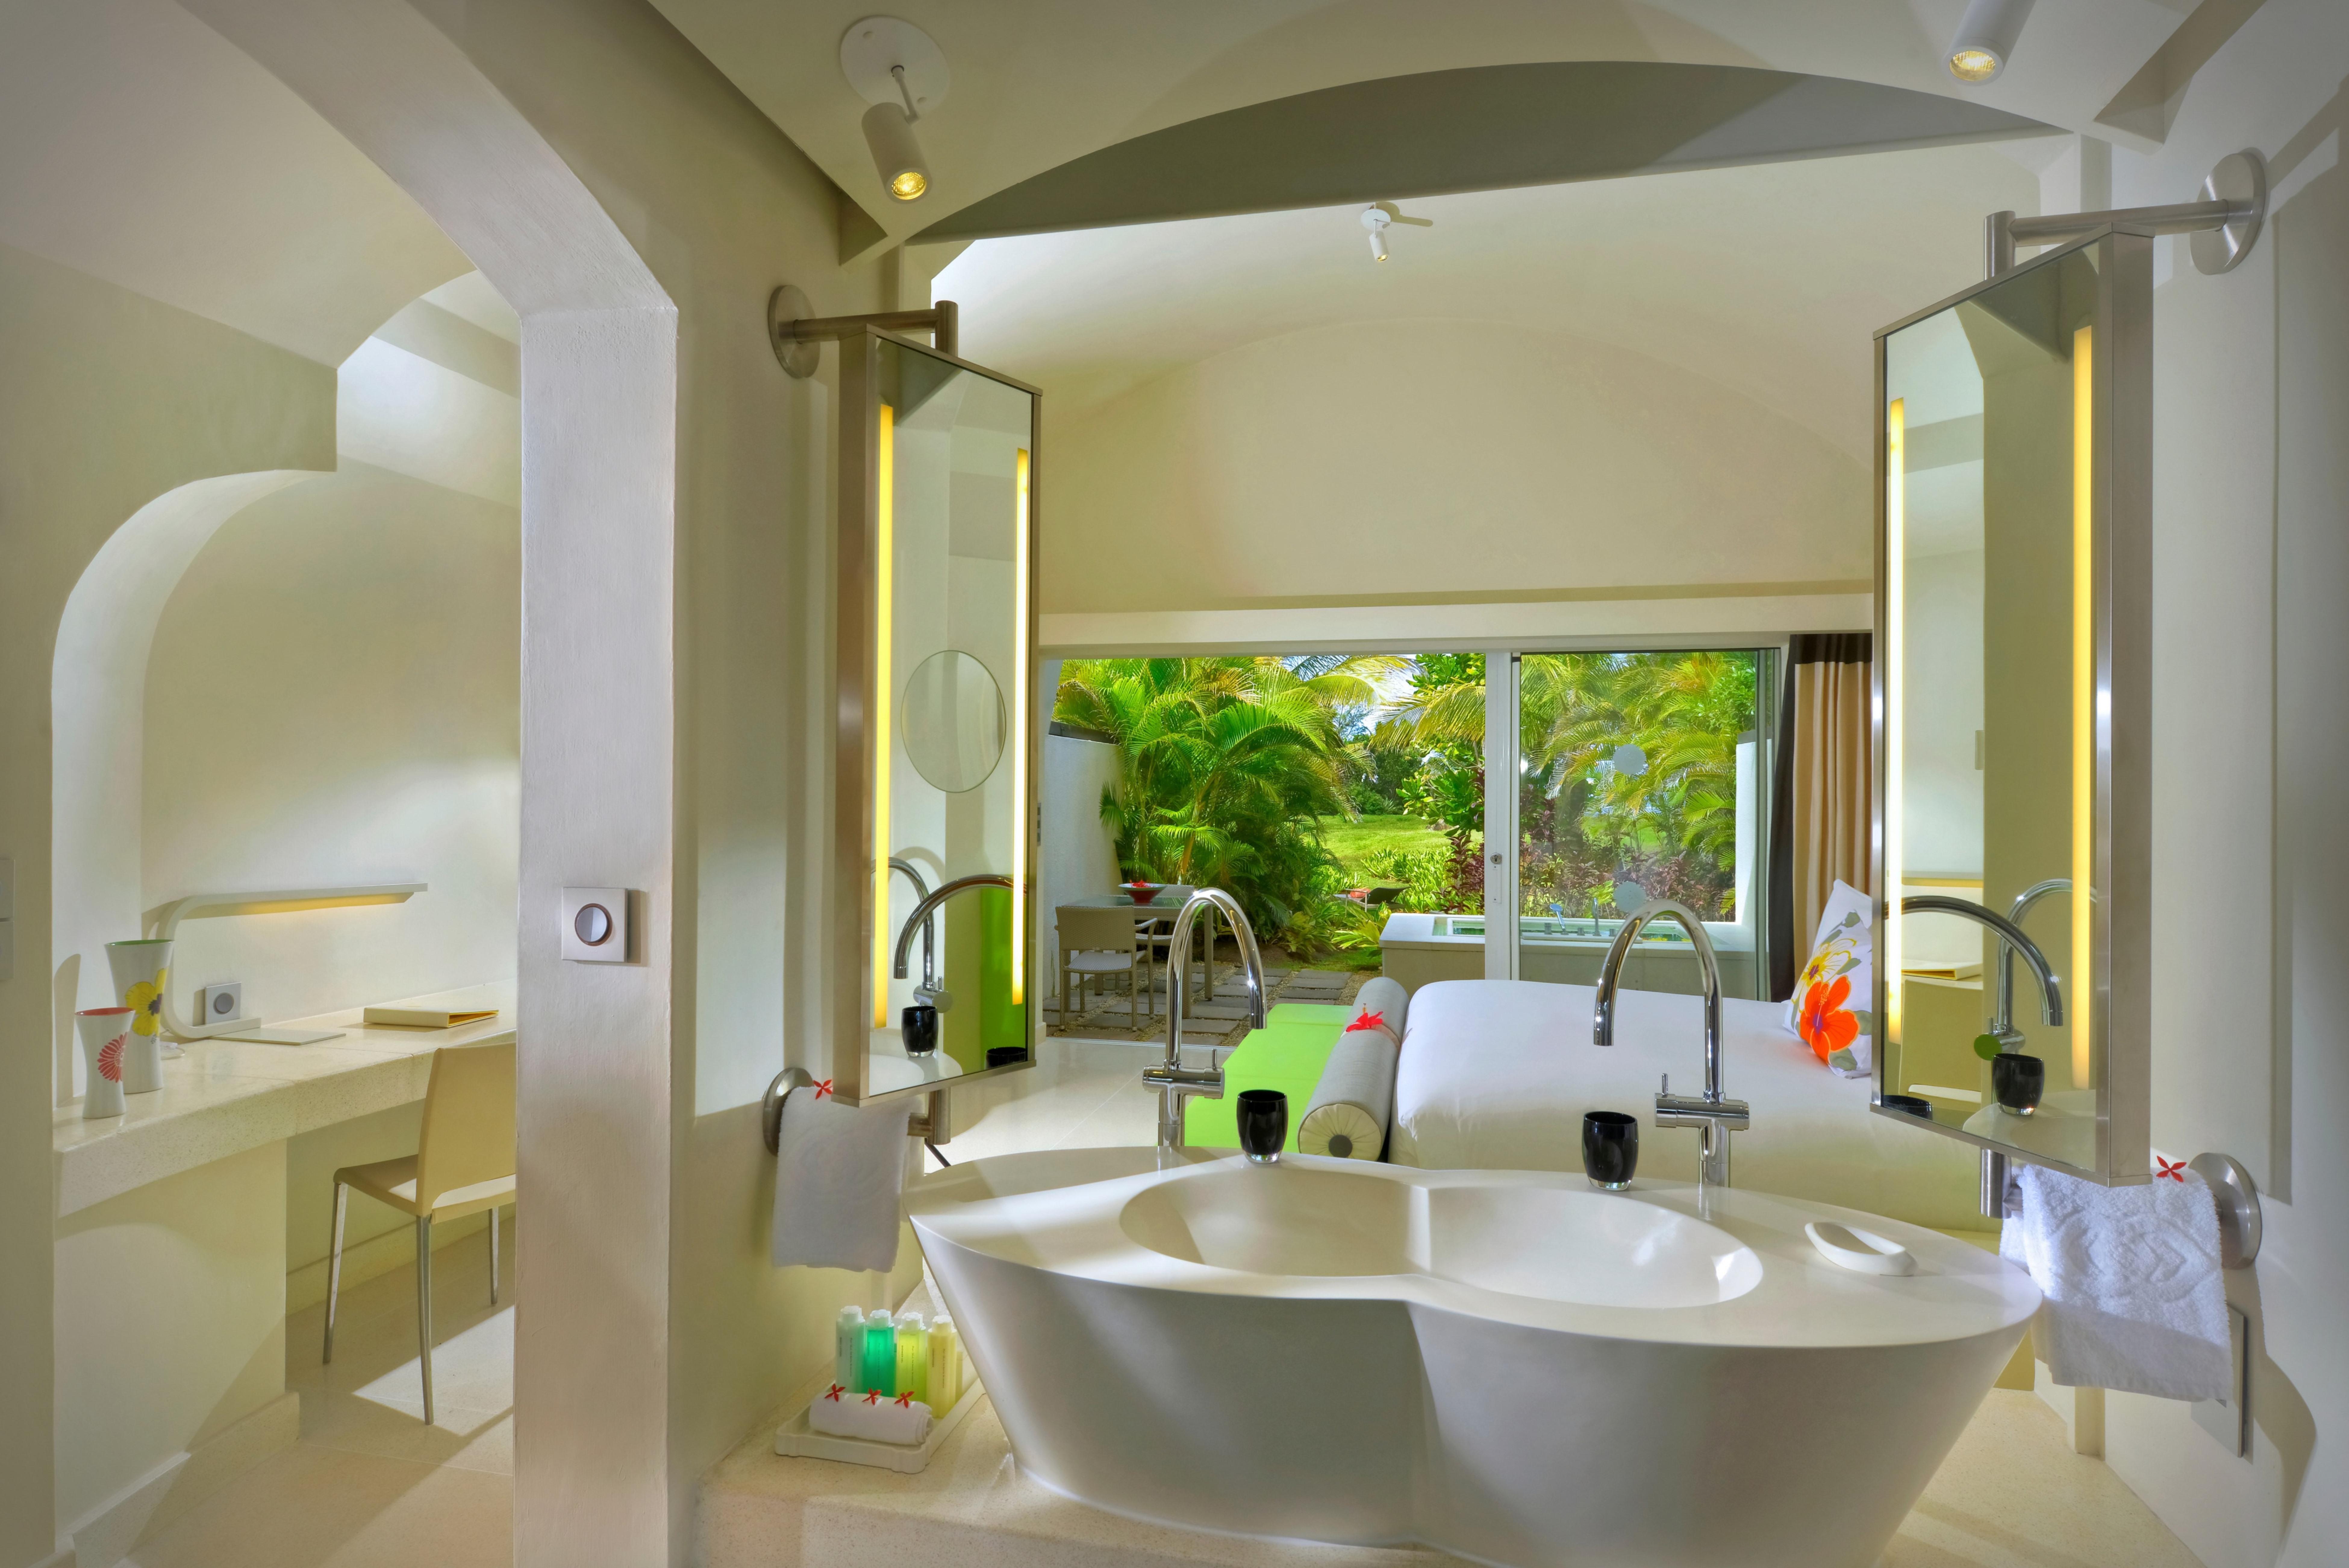 14_Sofitel-So-Mauritius-Bathroom-Lushury-room-Beach-Villa